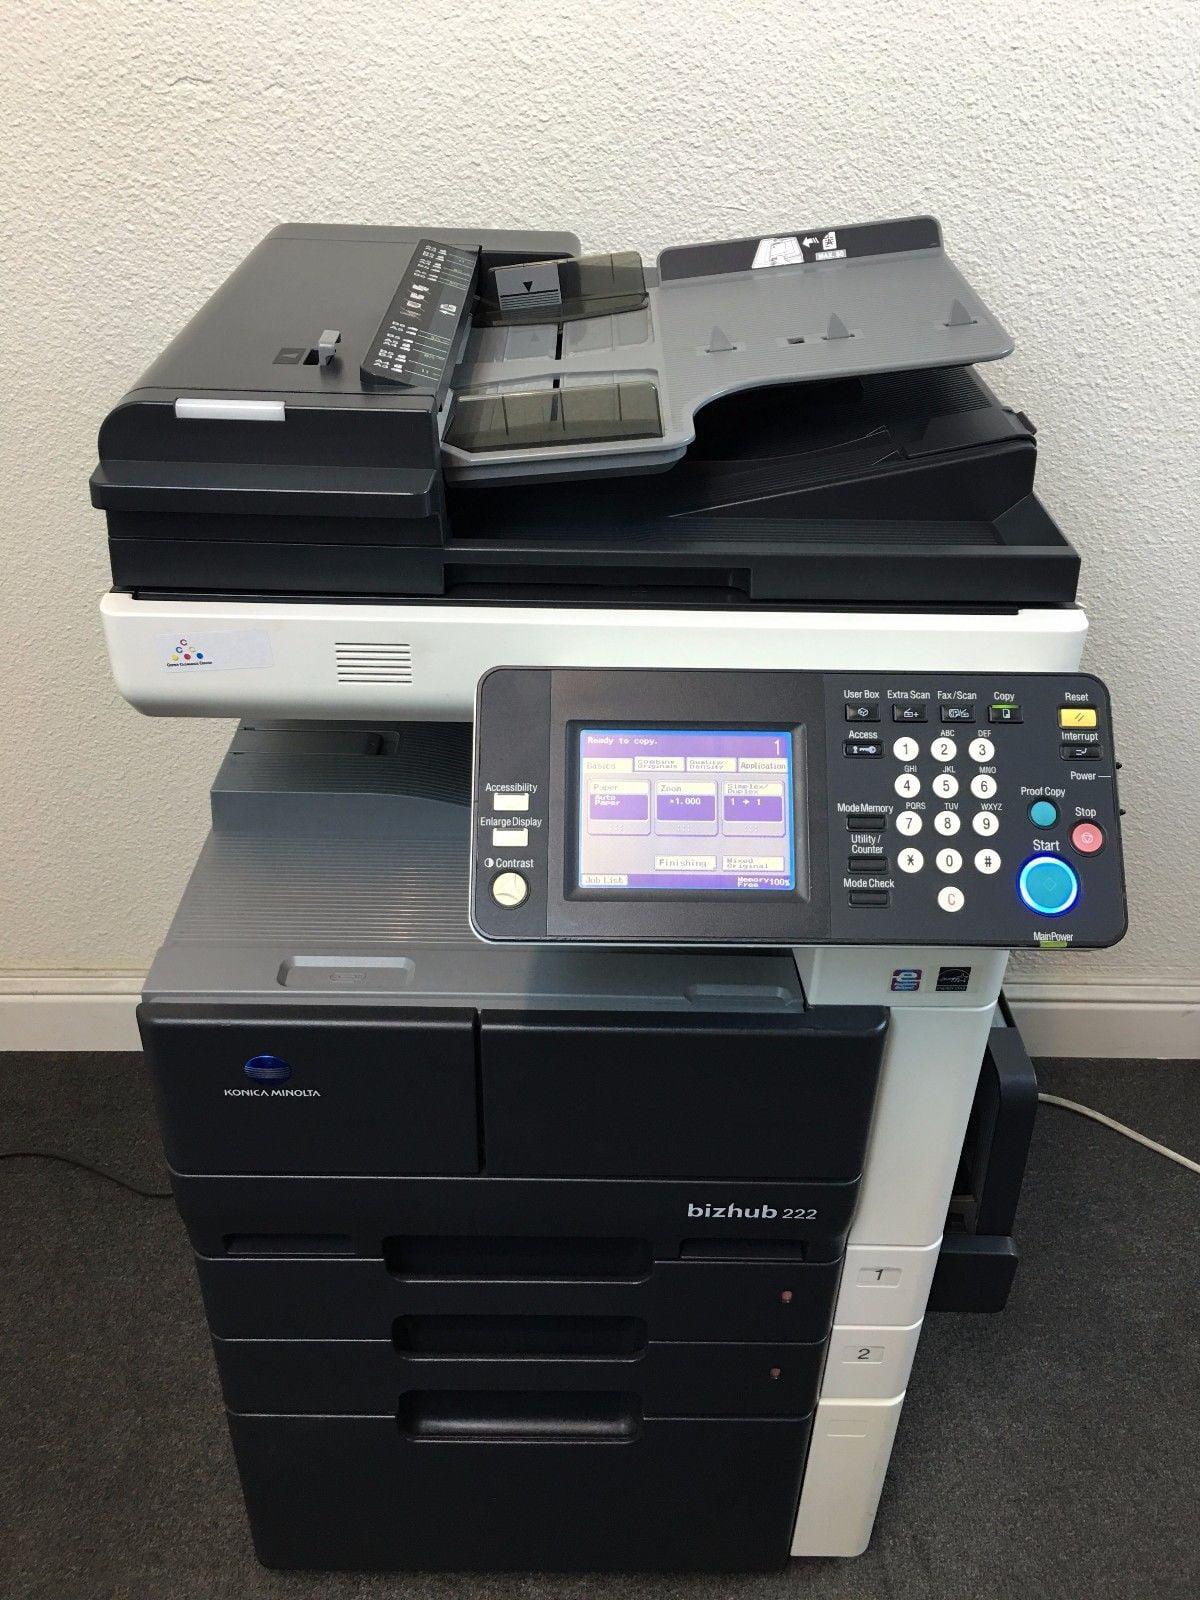 Konica Minolta Bizhub 222 Copier Printer Scanner Network LOW meter 83k total ! by Konica Minolta